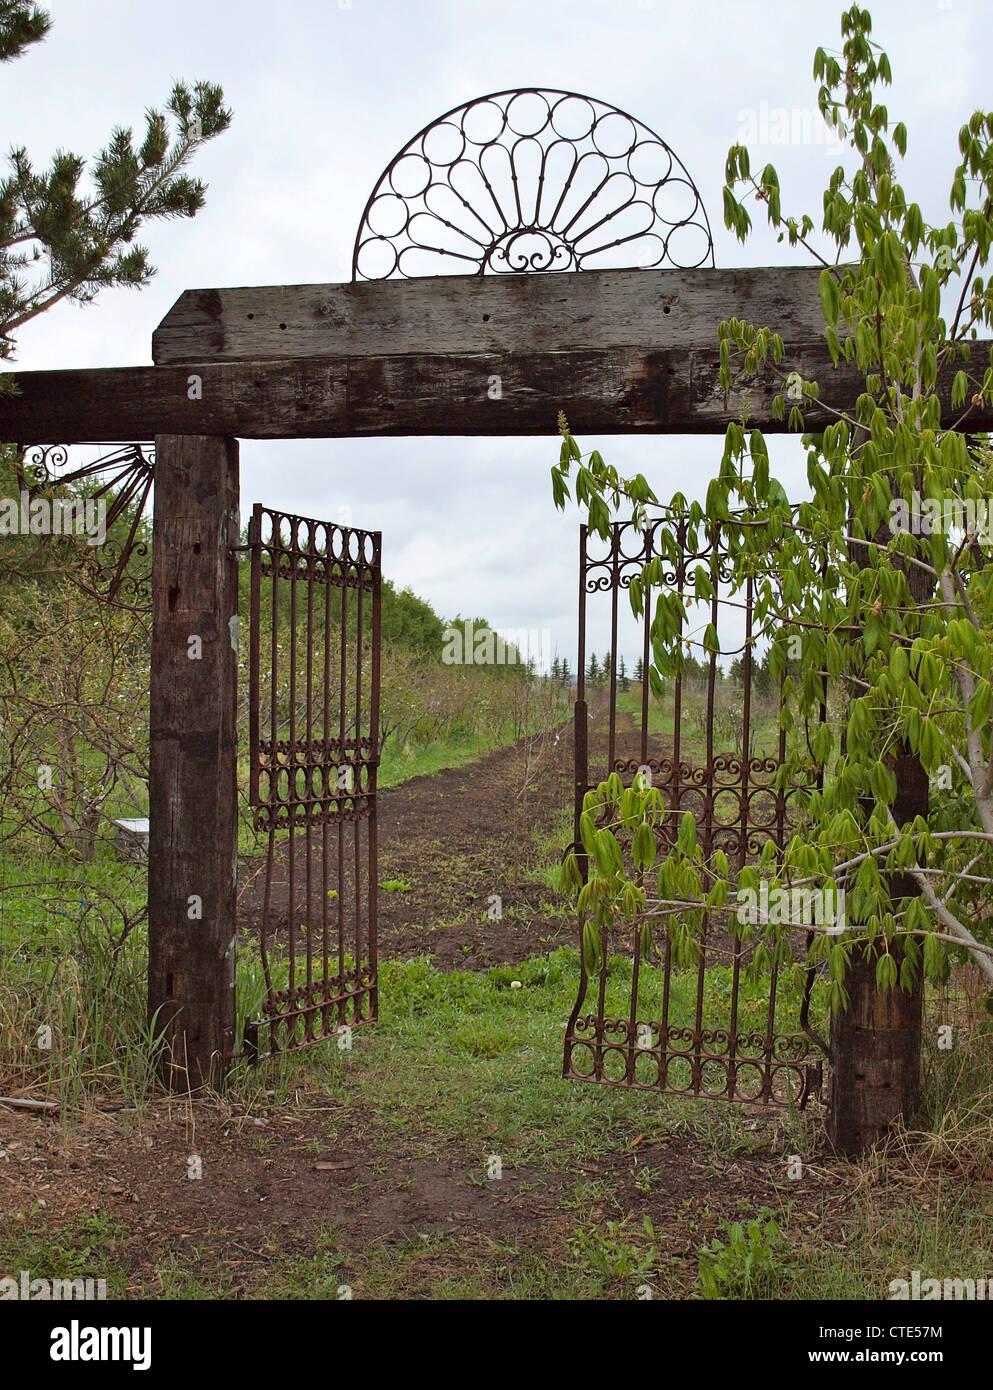 Wood and Iron Garden Gate Stock Photo